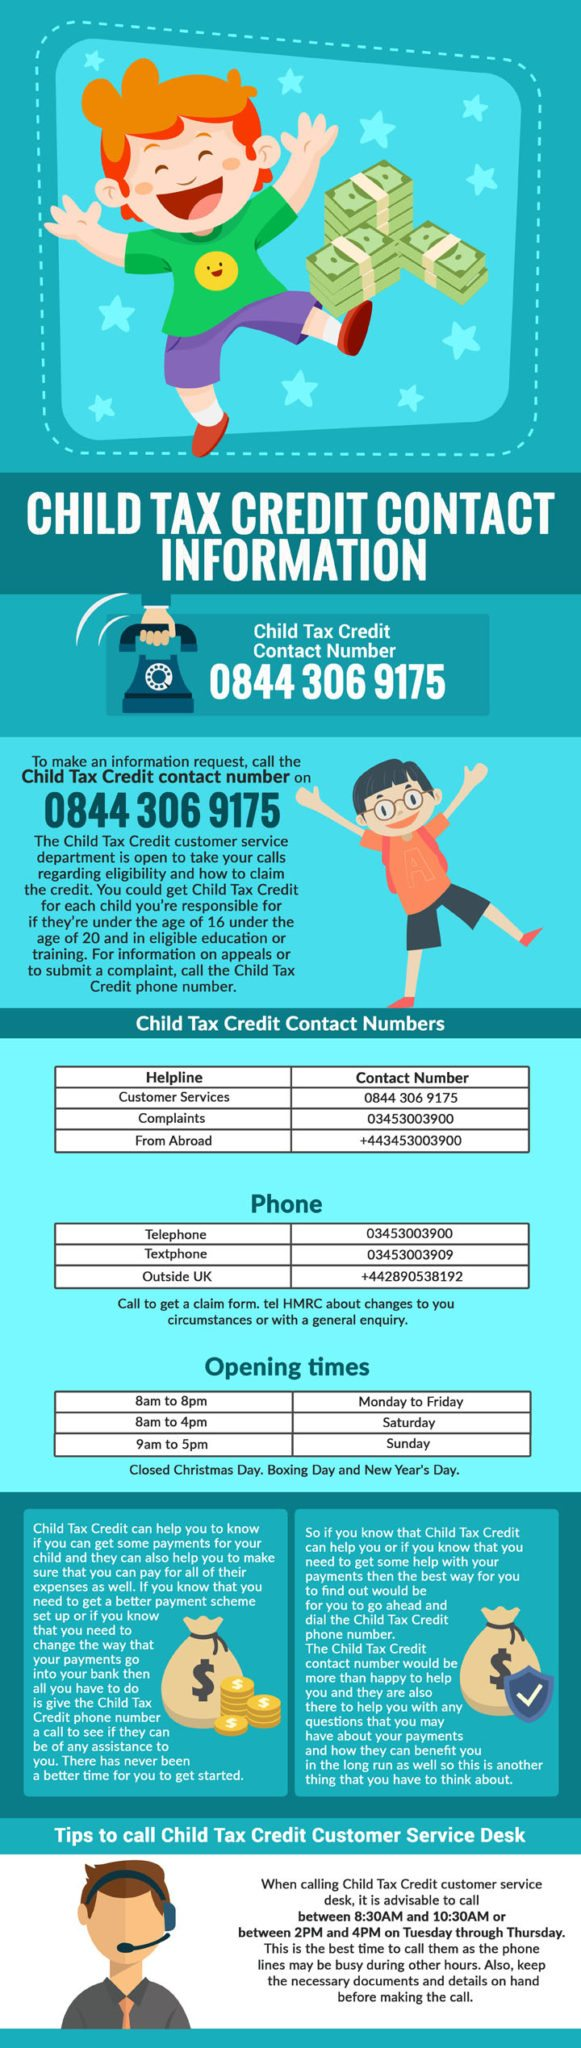 Child Tax Credit Customer Service